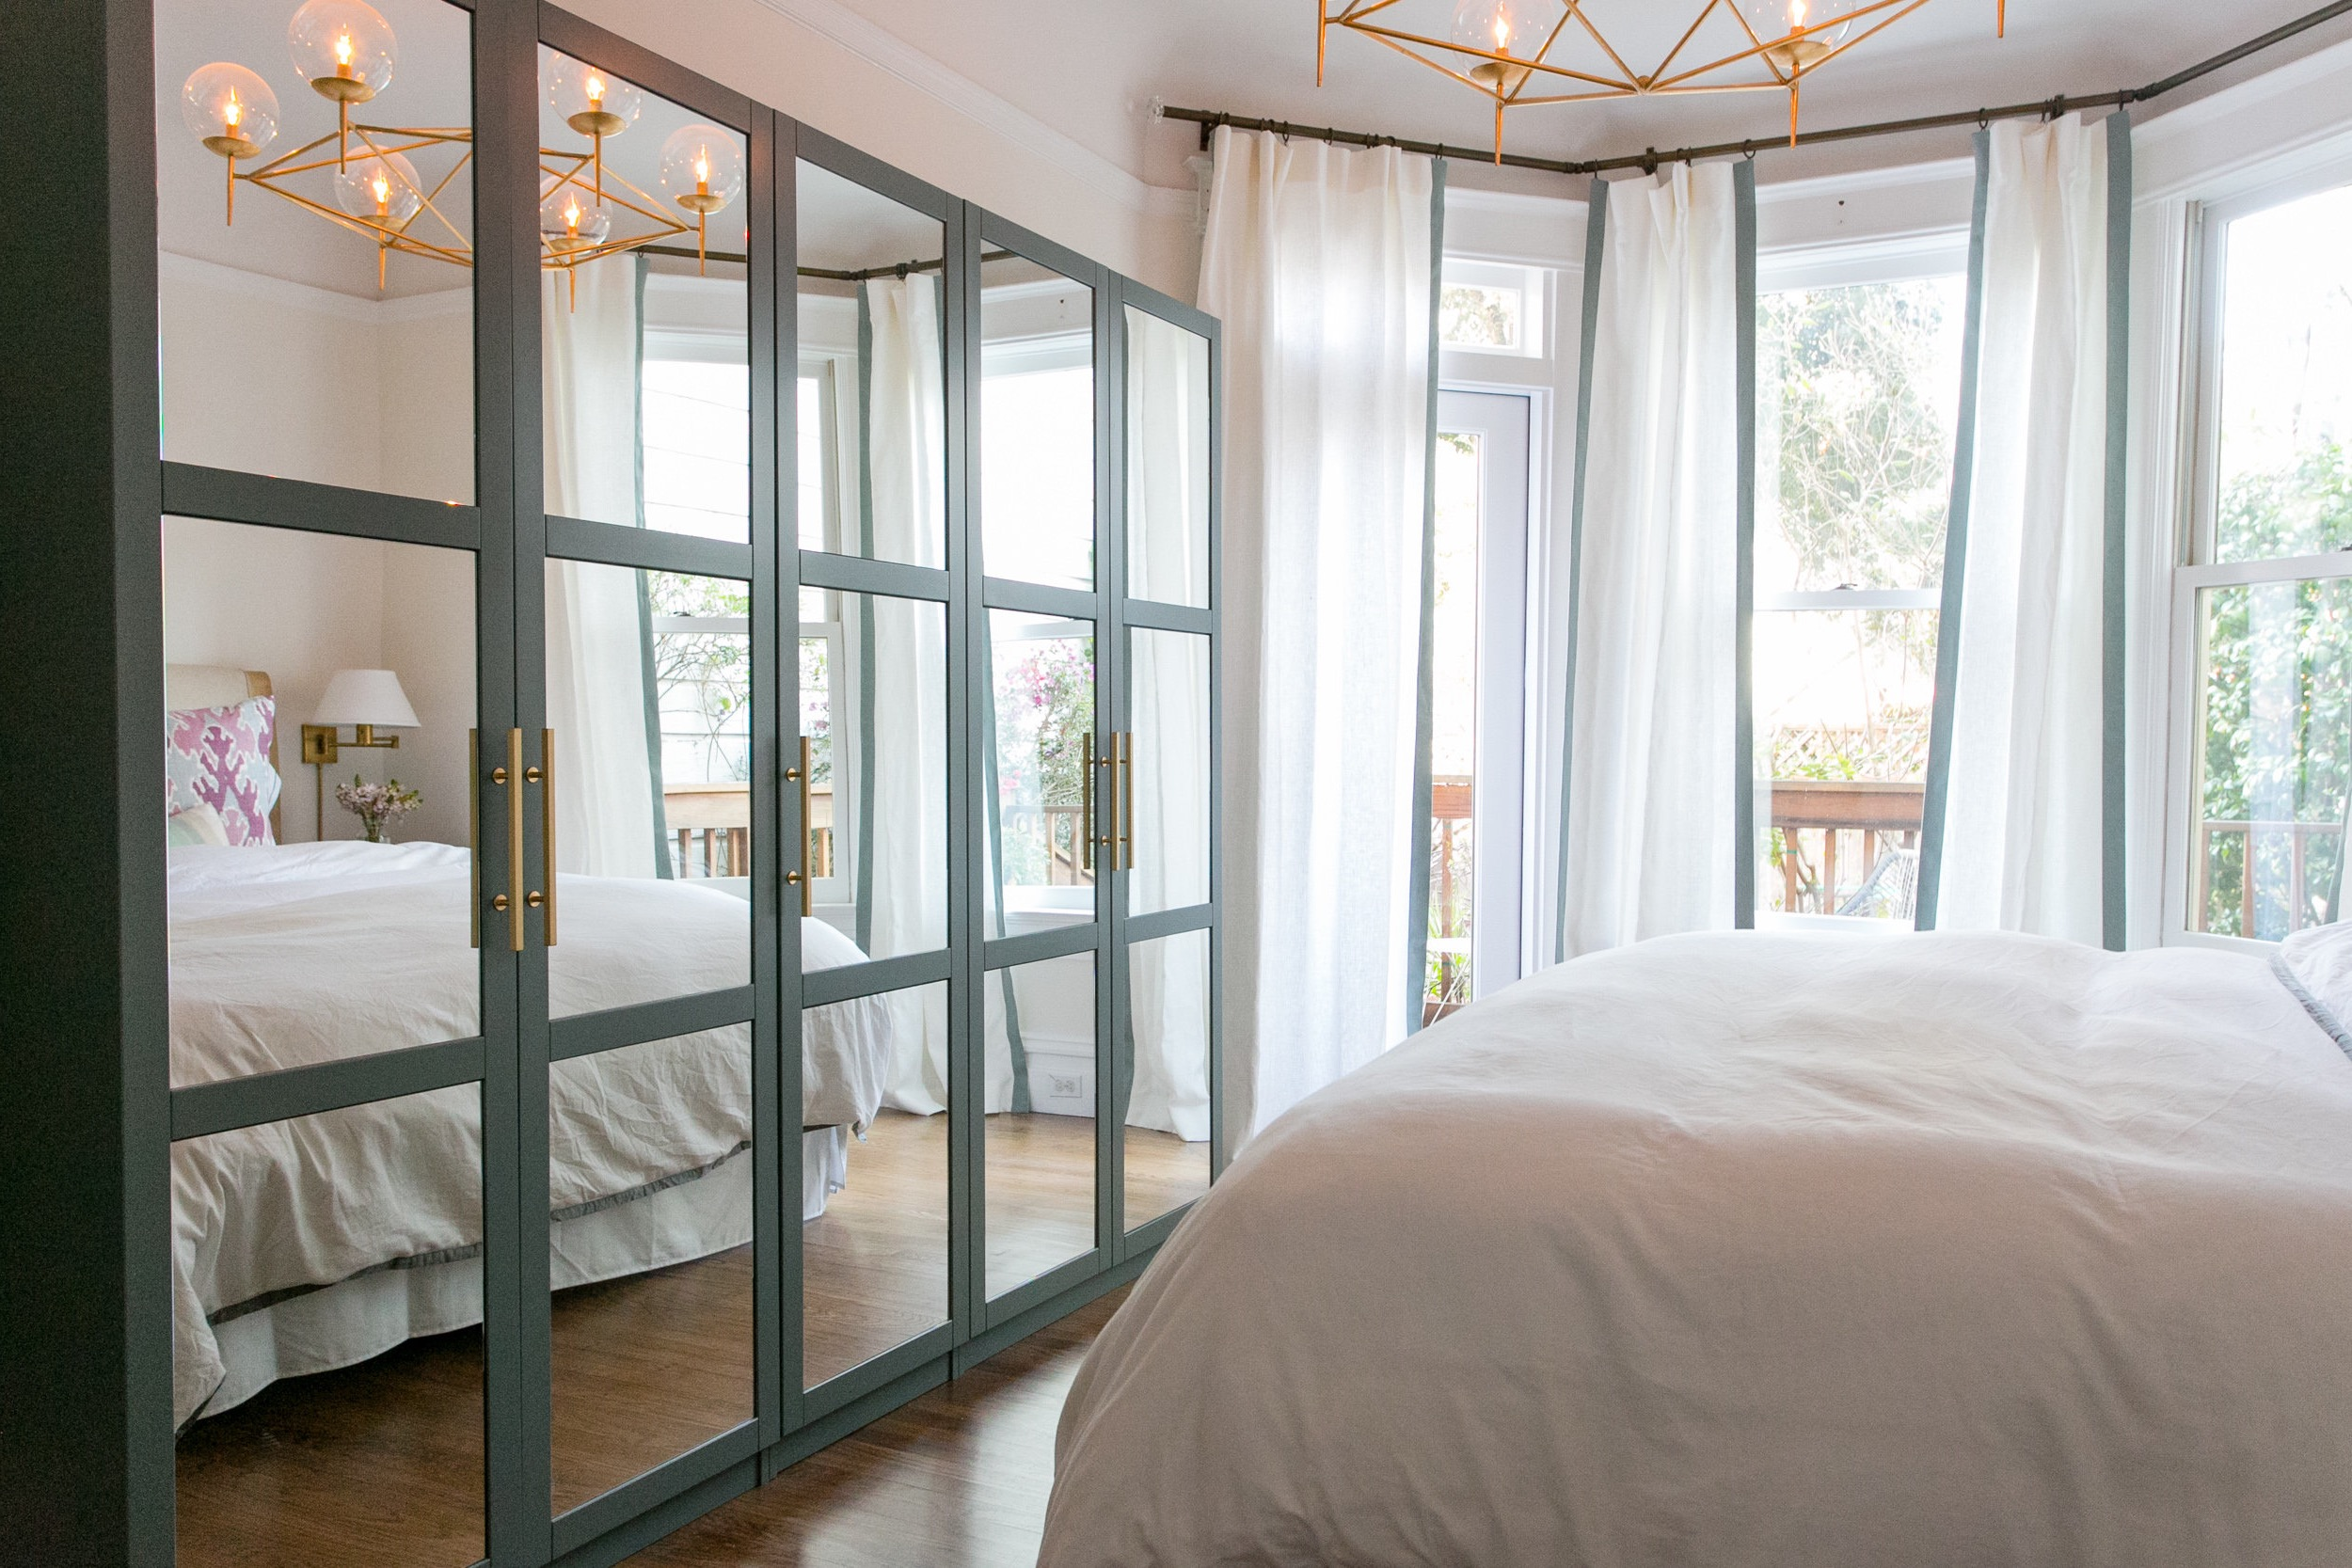 Contemporary Mirrored Bedroom Closet Doors (View 1 of 20)